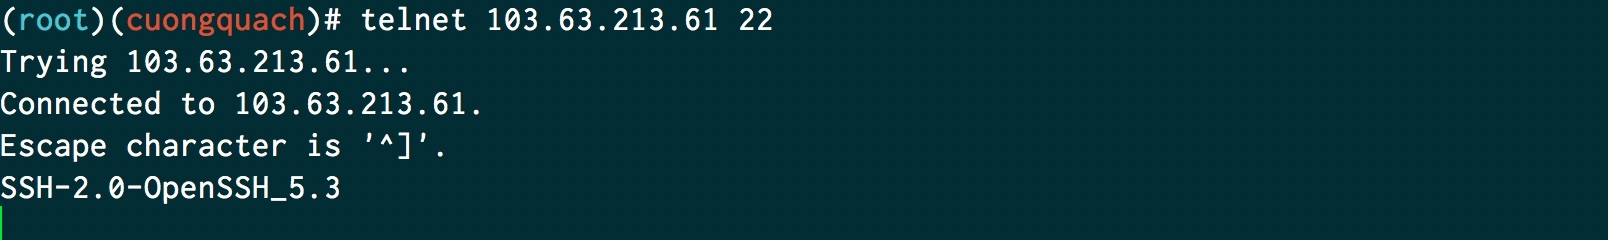 telnet port 22 đang sử dụng